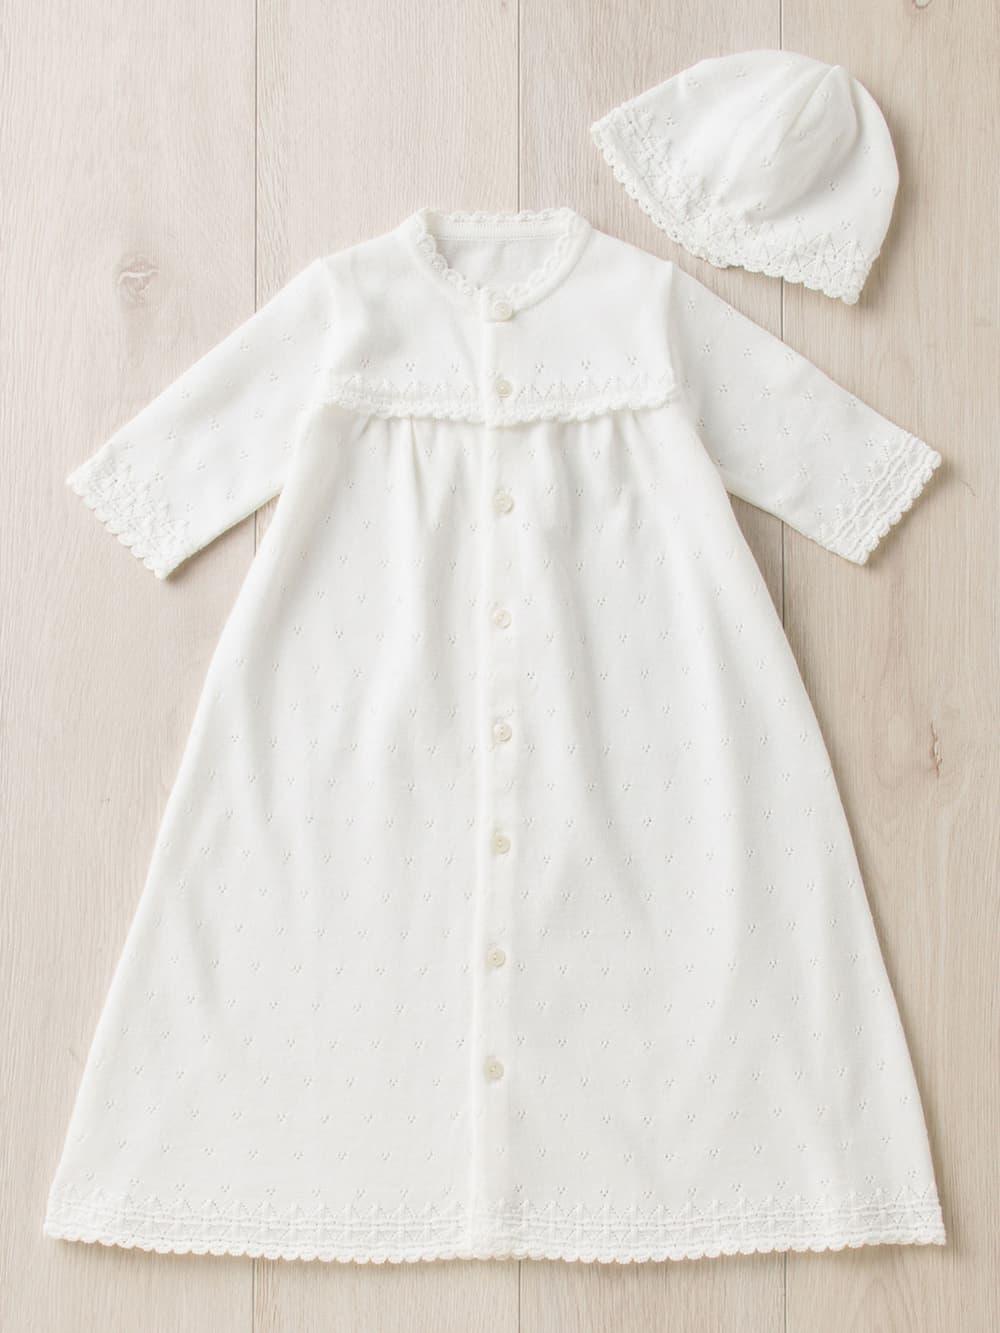 【ANGELIEBE/エンジェリーベ】 【日本製】ギフトボックス付新生児ニットドレス&帽子 2点セット ホワイト 50-70